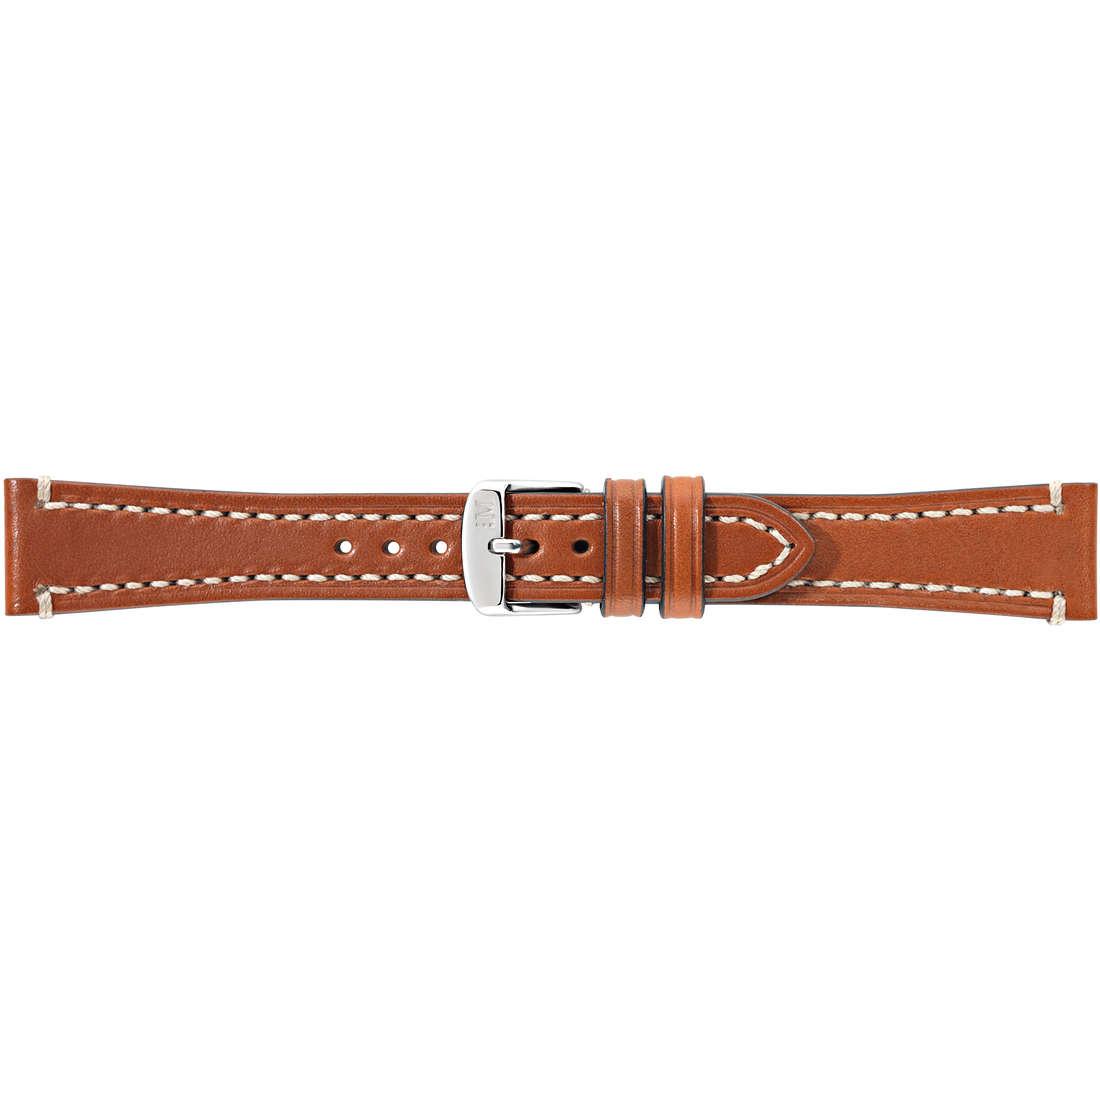 watch watch bands watch straps man Morellato Manufatti A01X4539B51041CR24